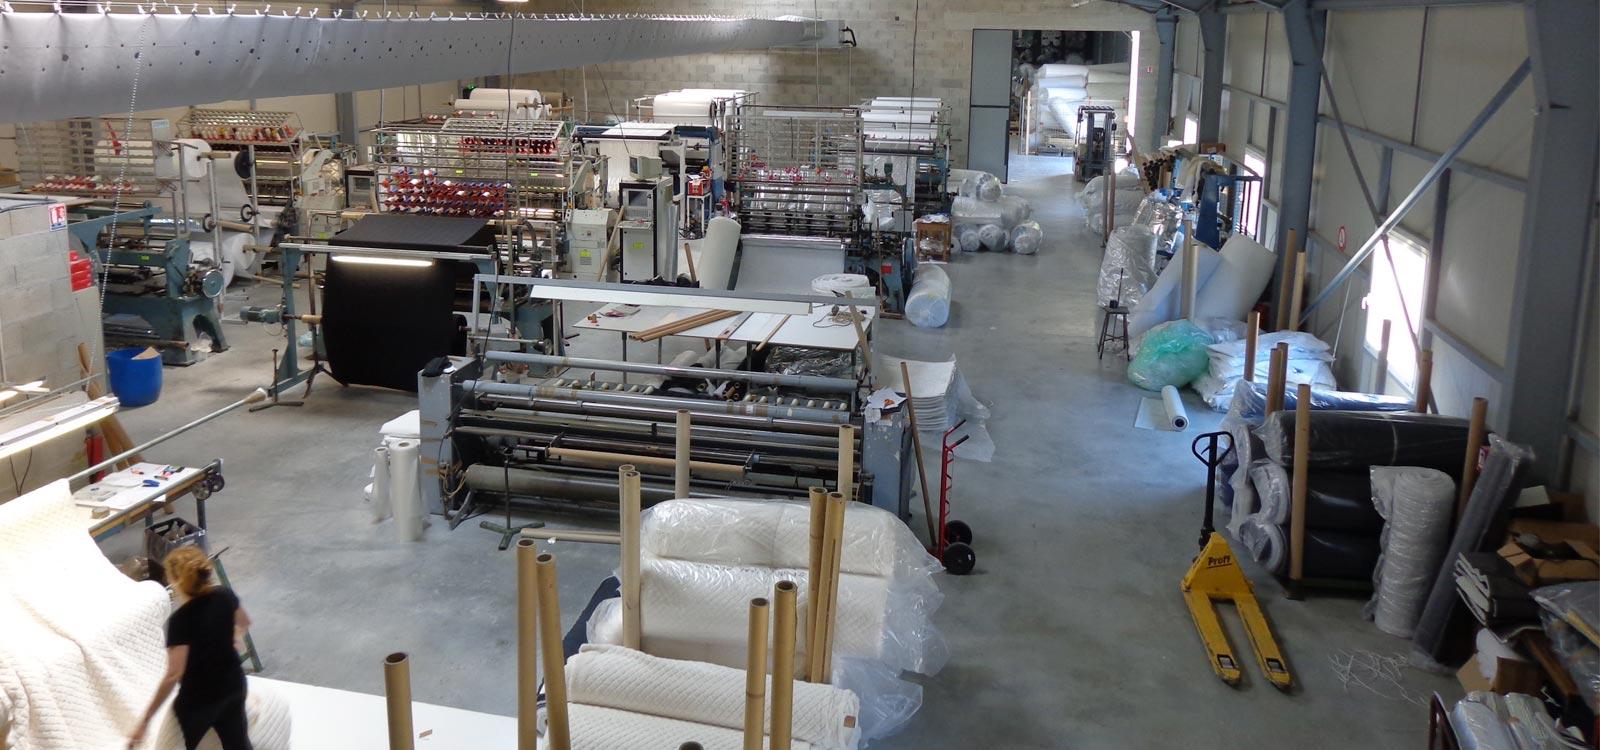 Ouatinage et assemblage des alpes fabricant d 39 isolant mince oaa fabri - Isolants minces coefficient d isolation ...